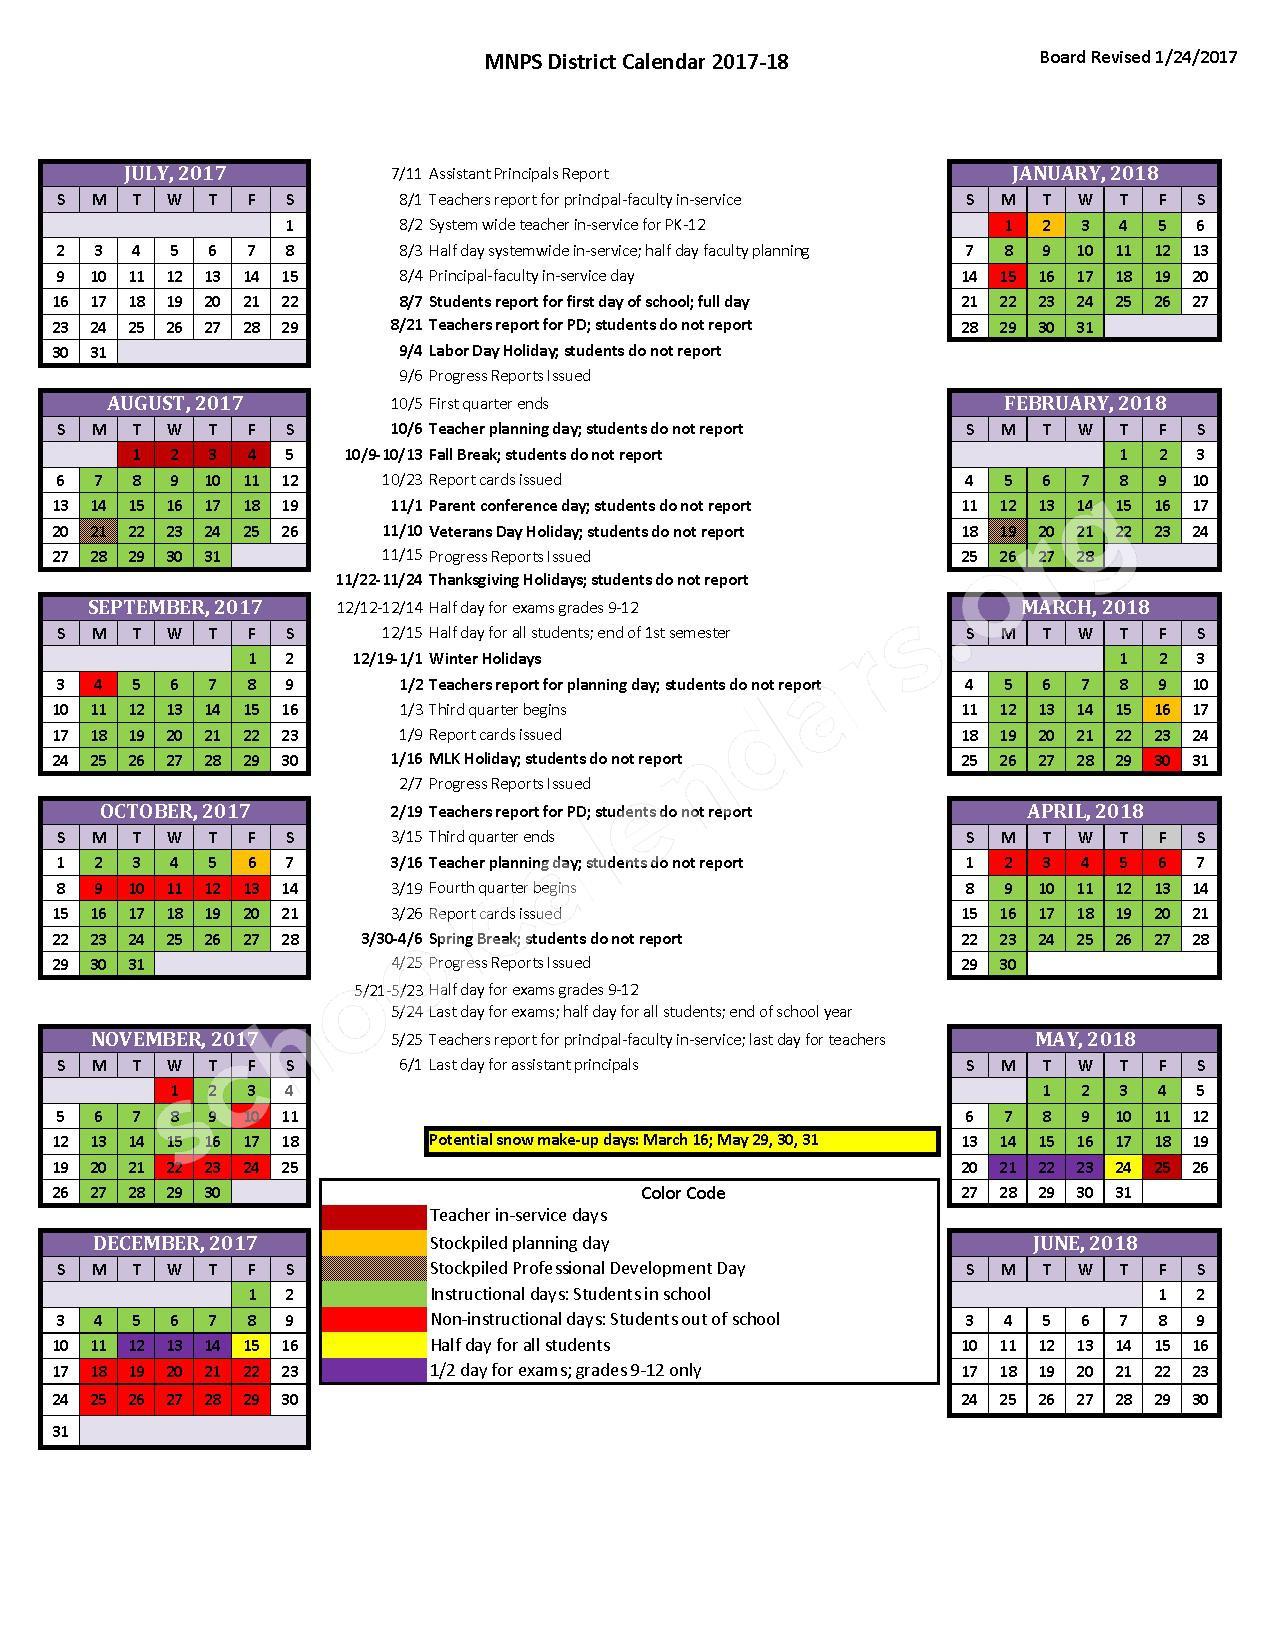 Davidson County Schools (Metropolitan Nashville Public Pertaining To When Is Spring Break For Davidson County Tn